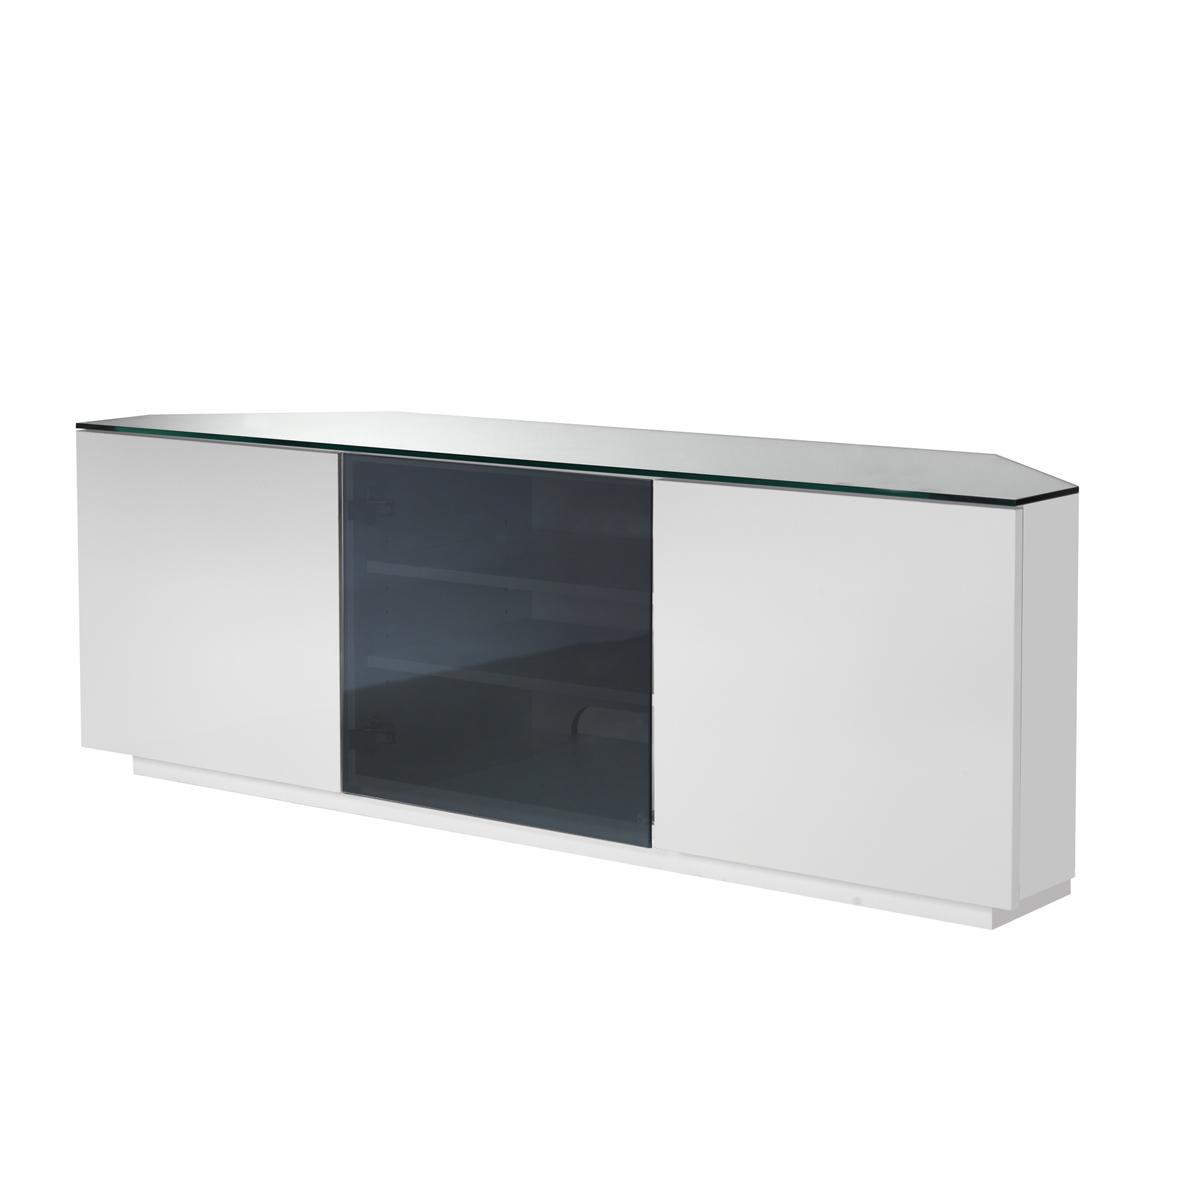 Black Gloss Corner Tv Stand Pertaining To Well Known Ukcf Milan White Gloss & Black Glass Corner Tv Stand 150cm (View 2 of 20)